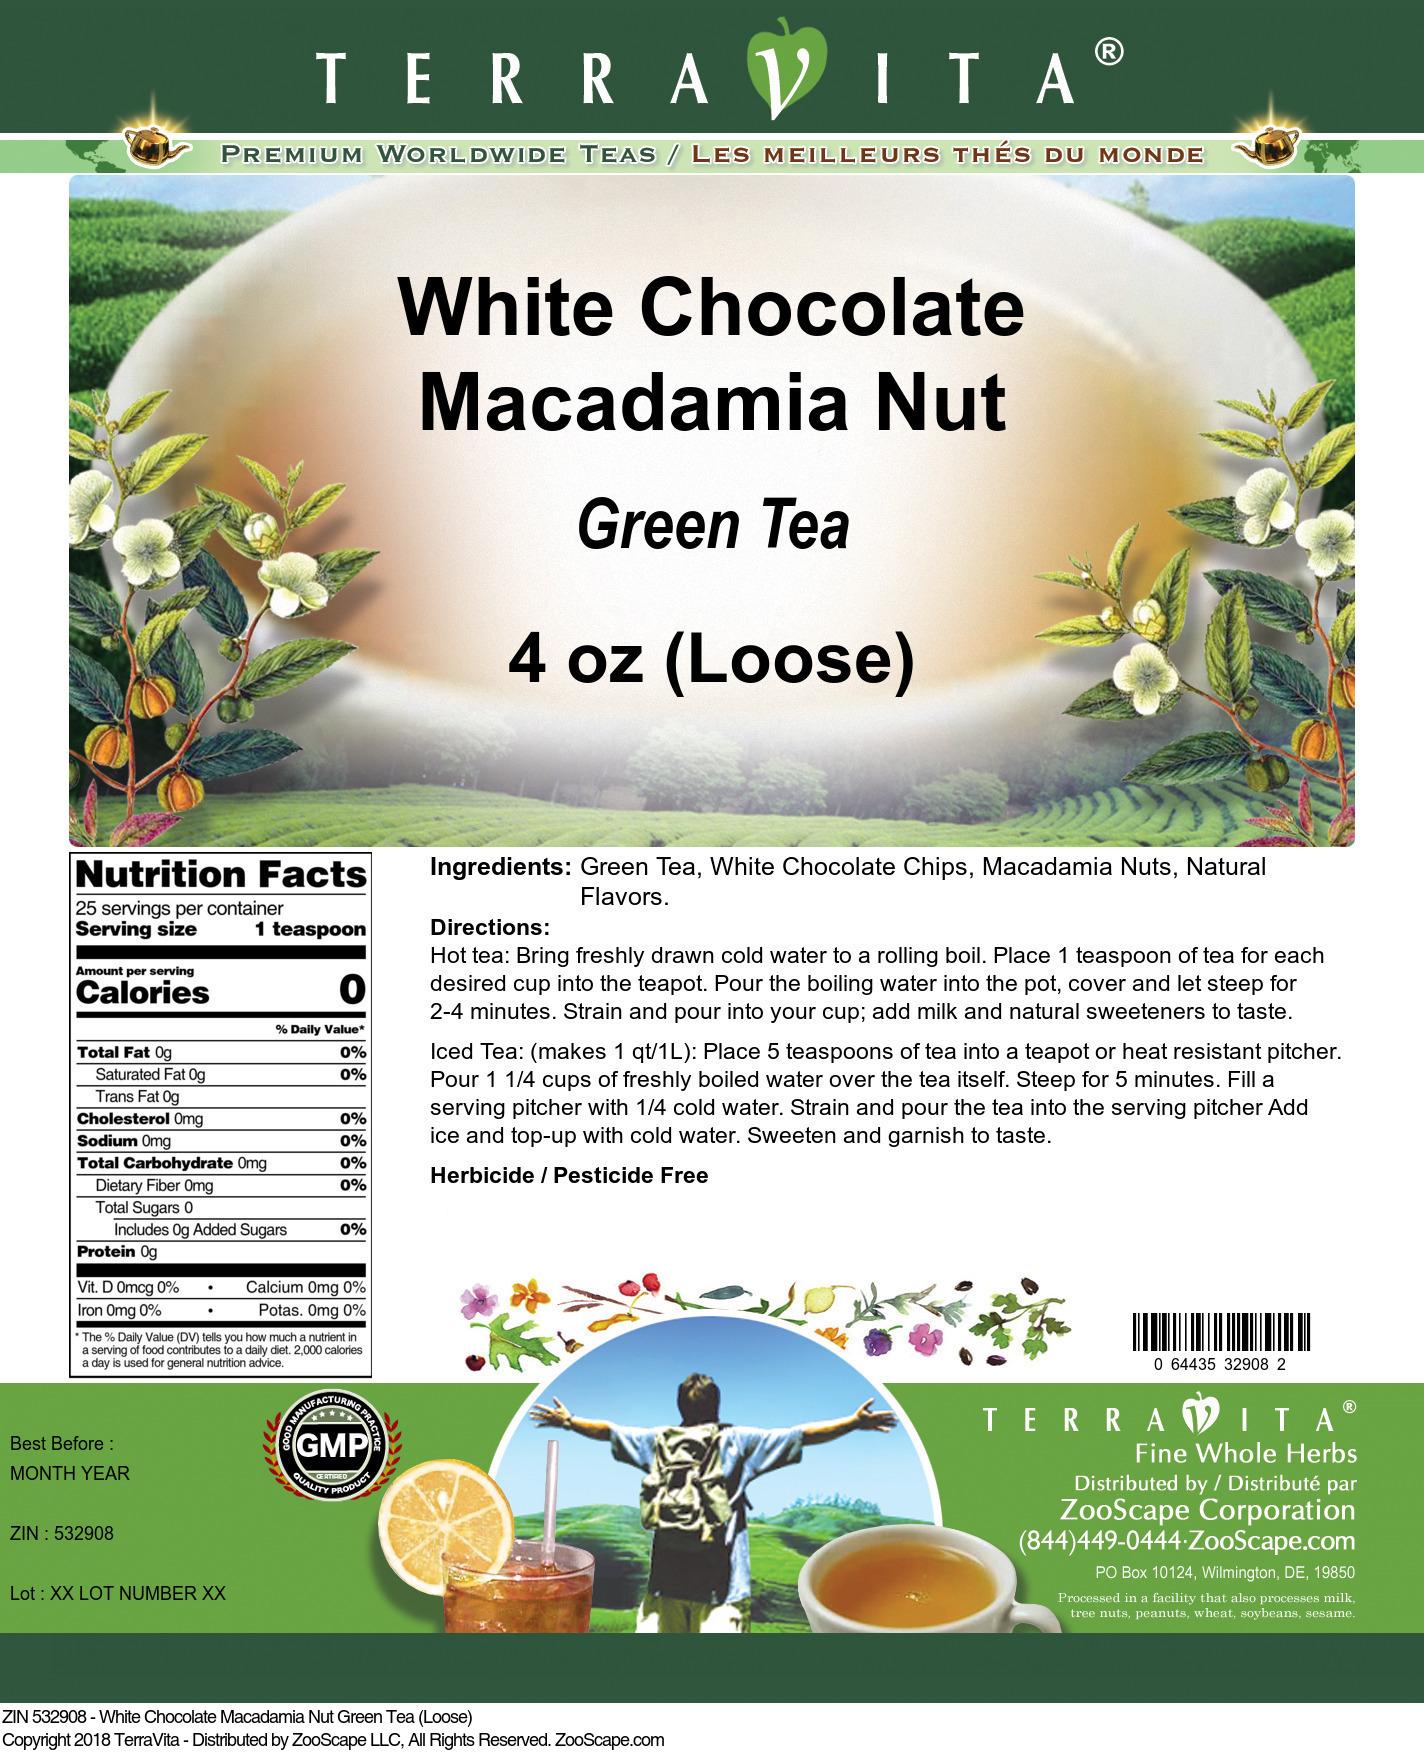 White Chocolate Macadamia Nut Green Tea (Loose)